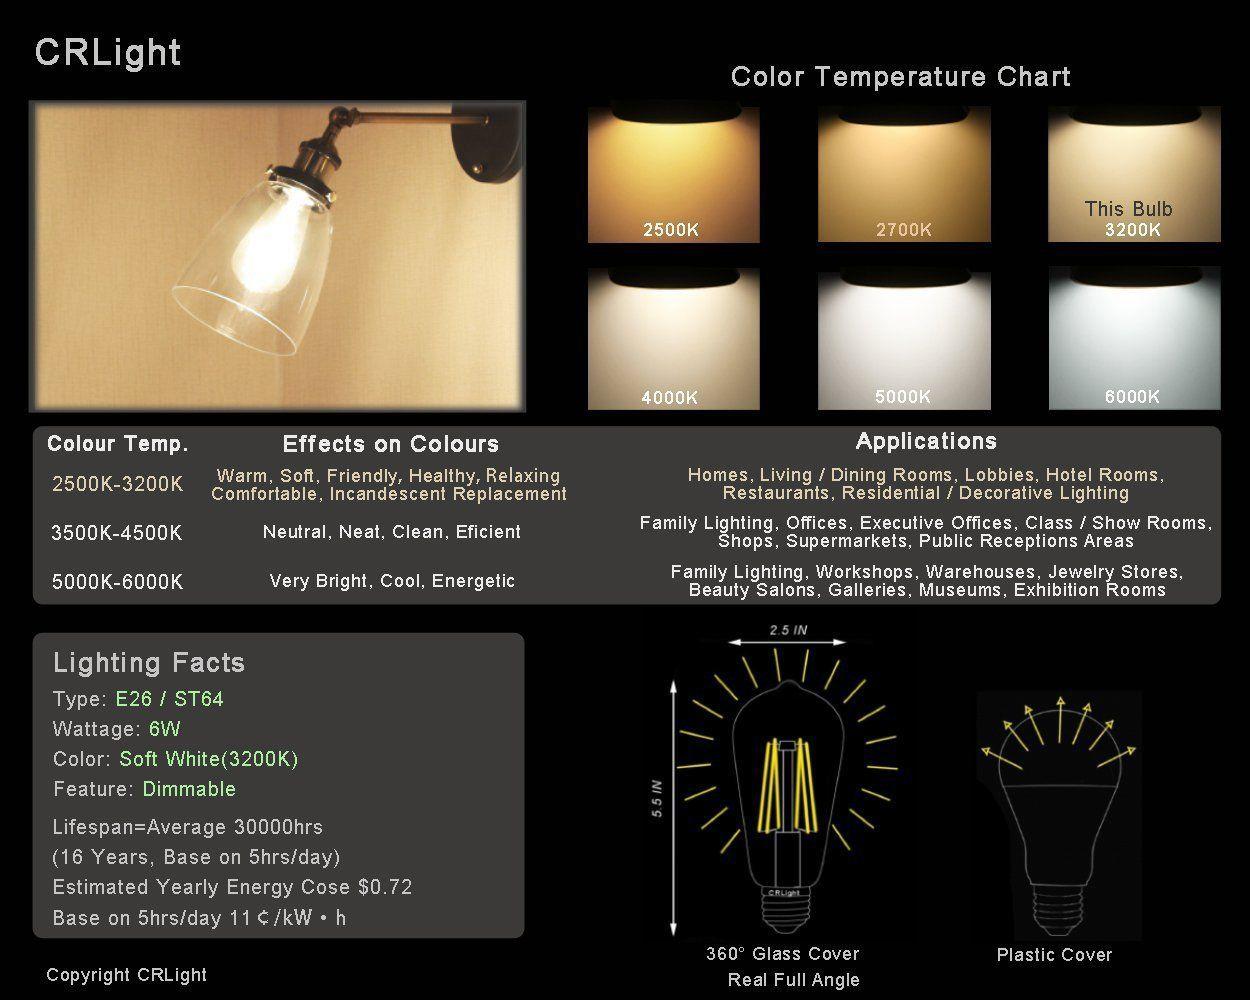 Crlight 6w Dimmable Edison Style Vintage Led Filament Light Bulb 3200k Soft White 600lm E26 Medium Base Lamp St Bulb Filament Bulb Lighting Candelabra Bulbs